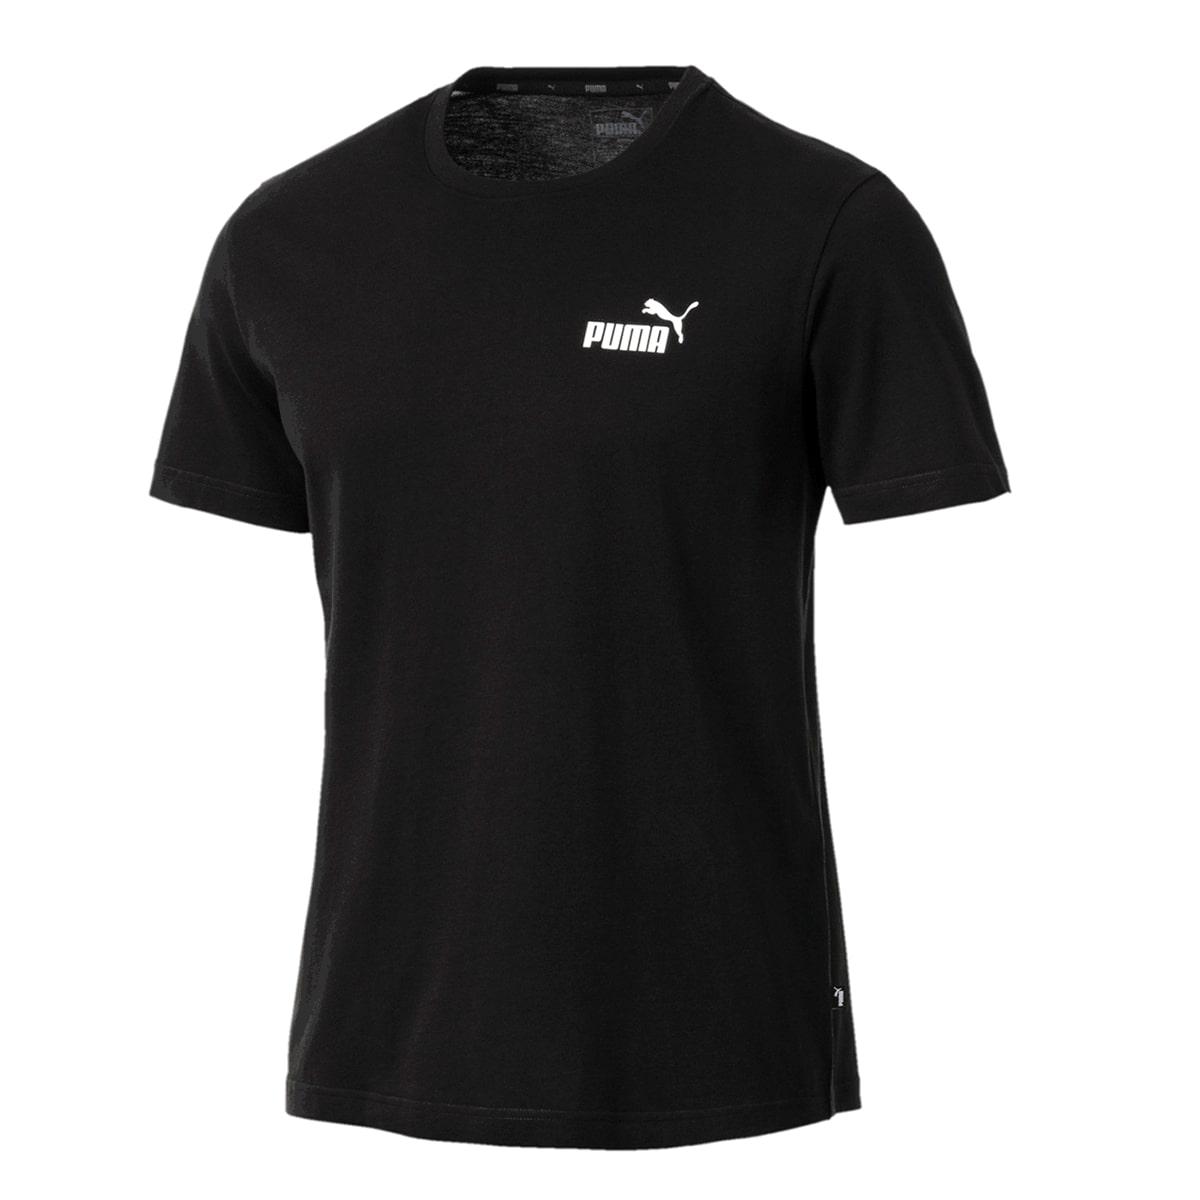 Camiseta Puma Essentials Small Logo Masculino Preto